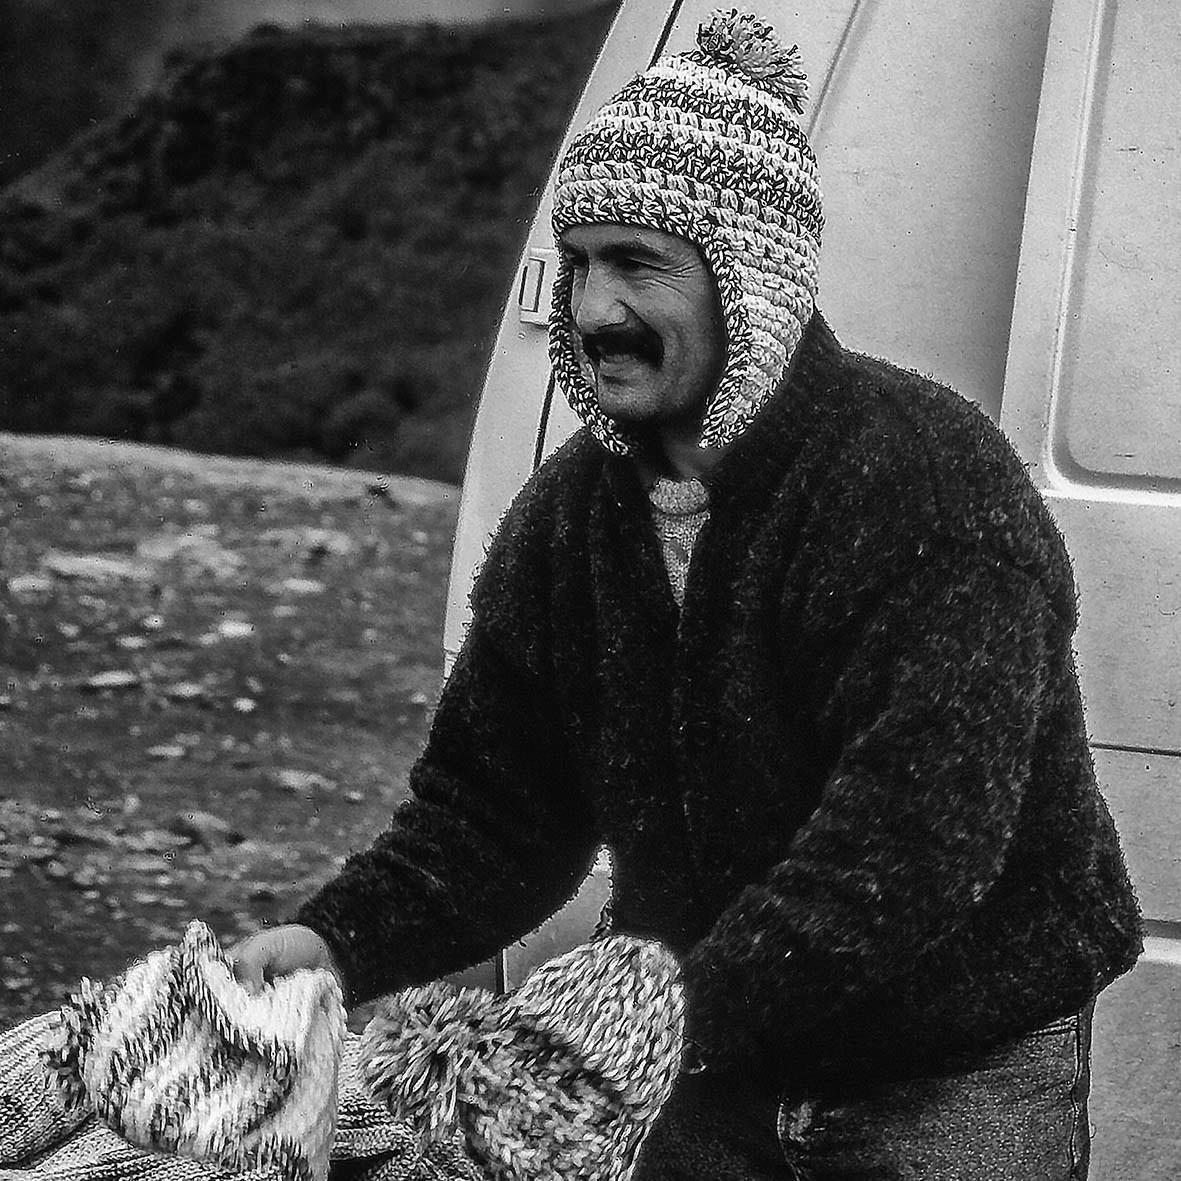 Haubenverkäufer, Madeira/Portugal, 03 1997